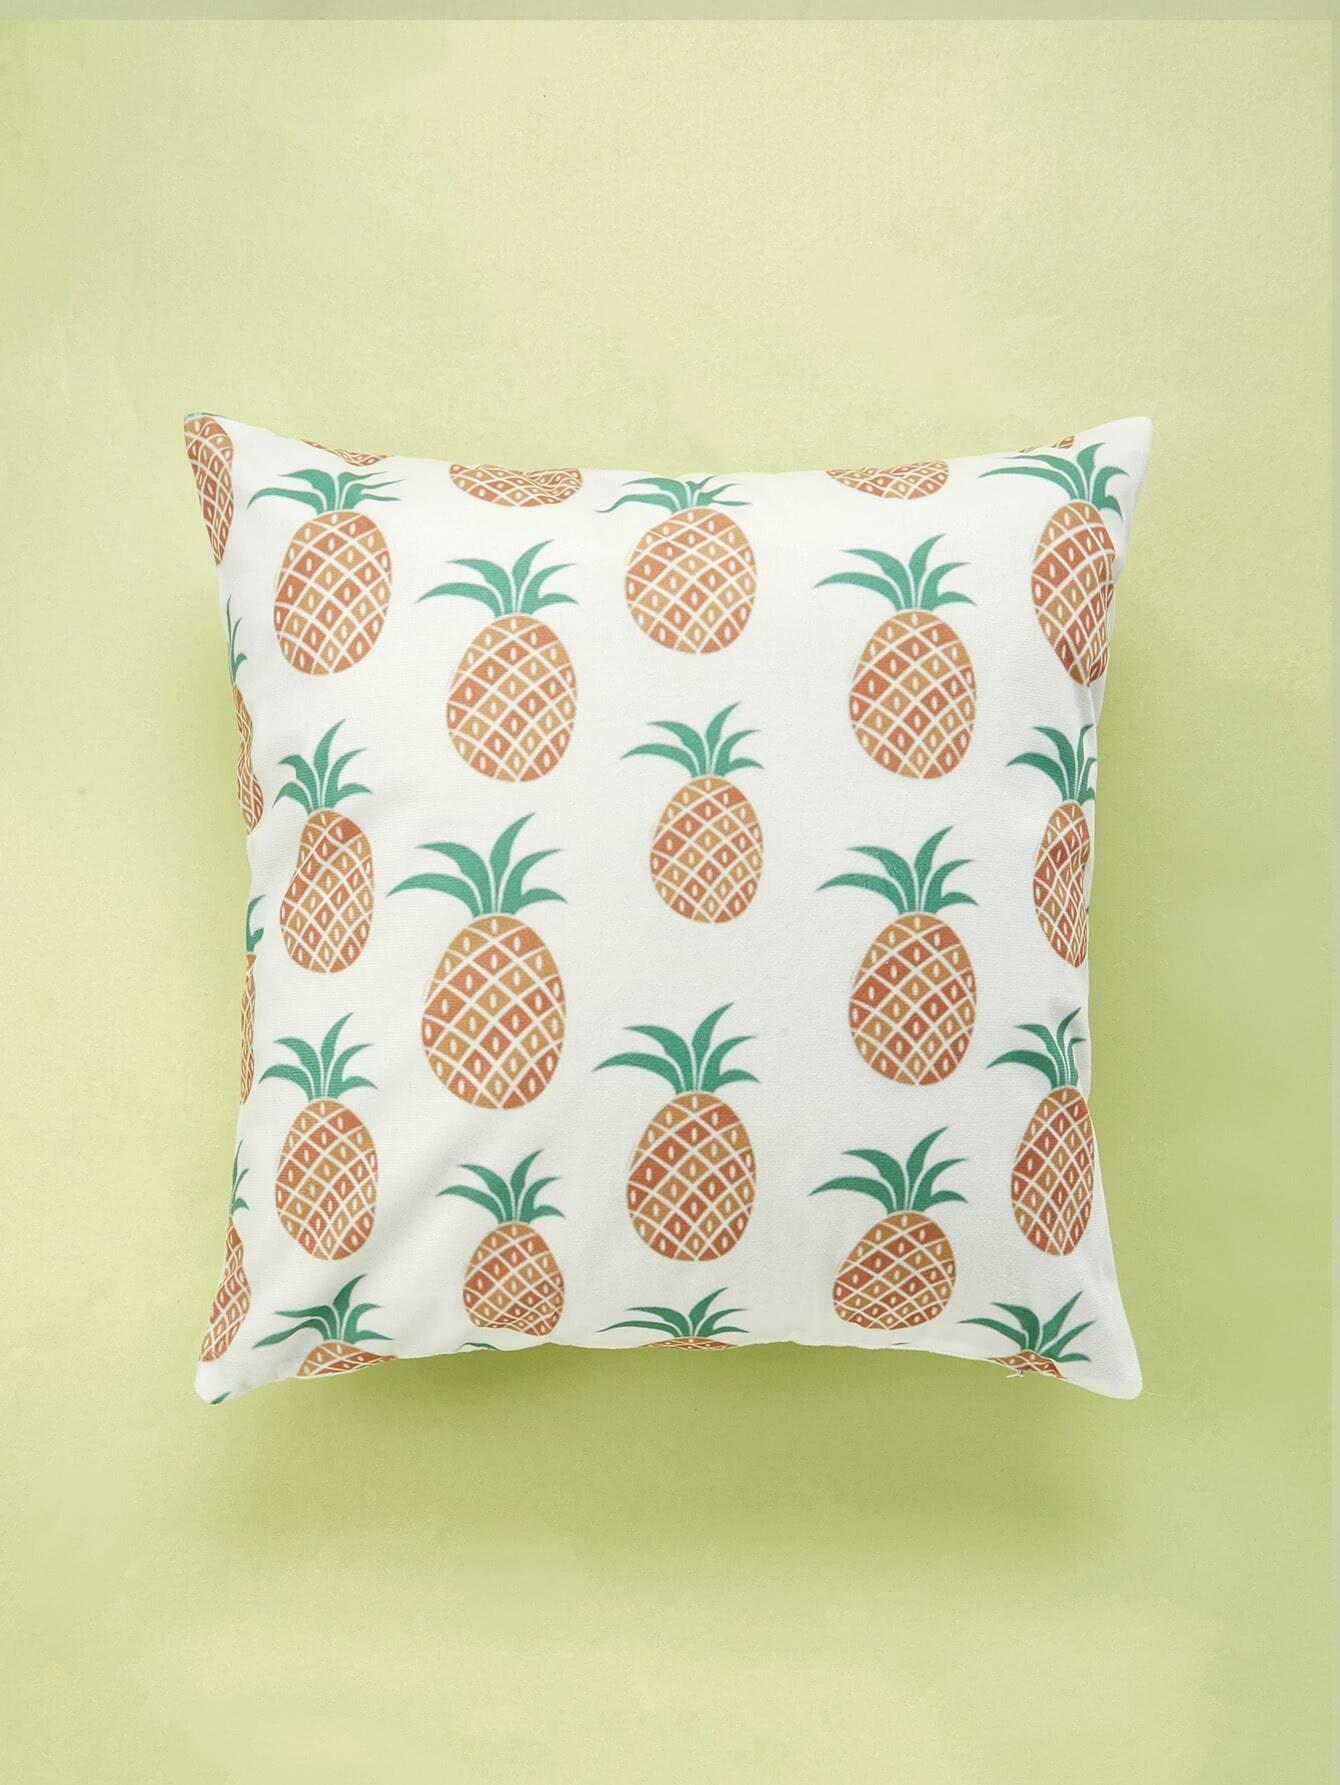 Pineapple Overlay Print Cushion Cover